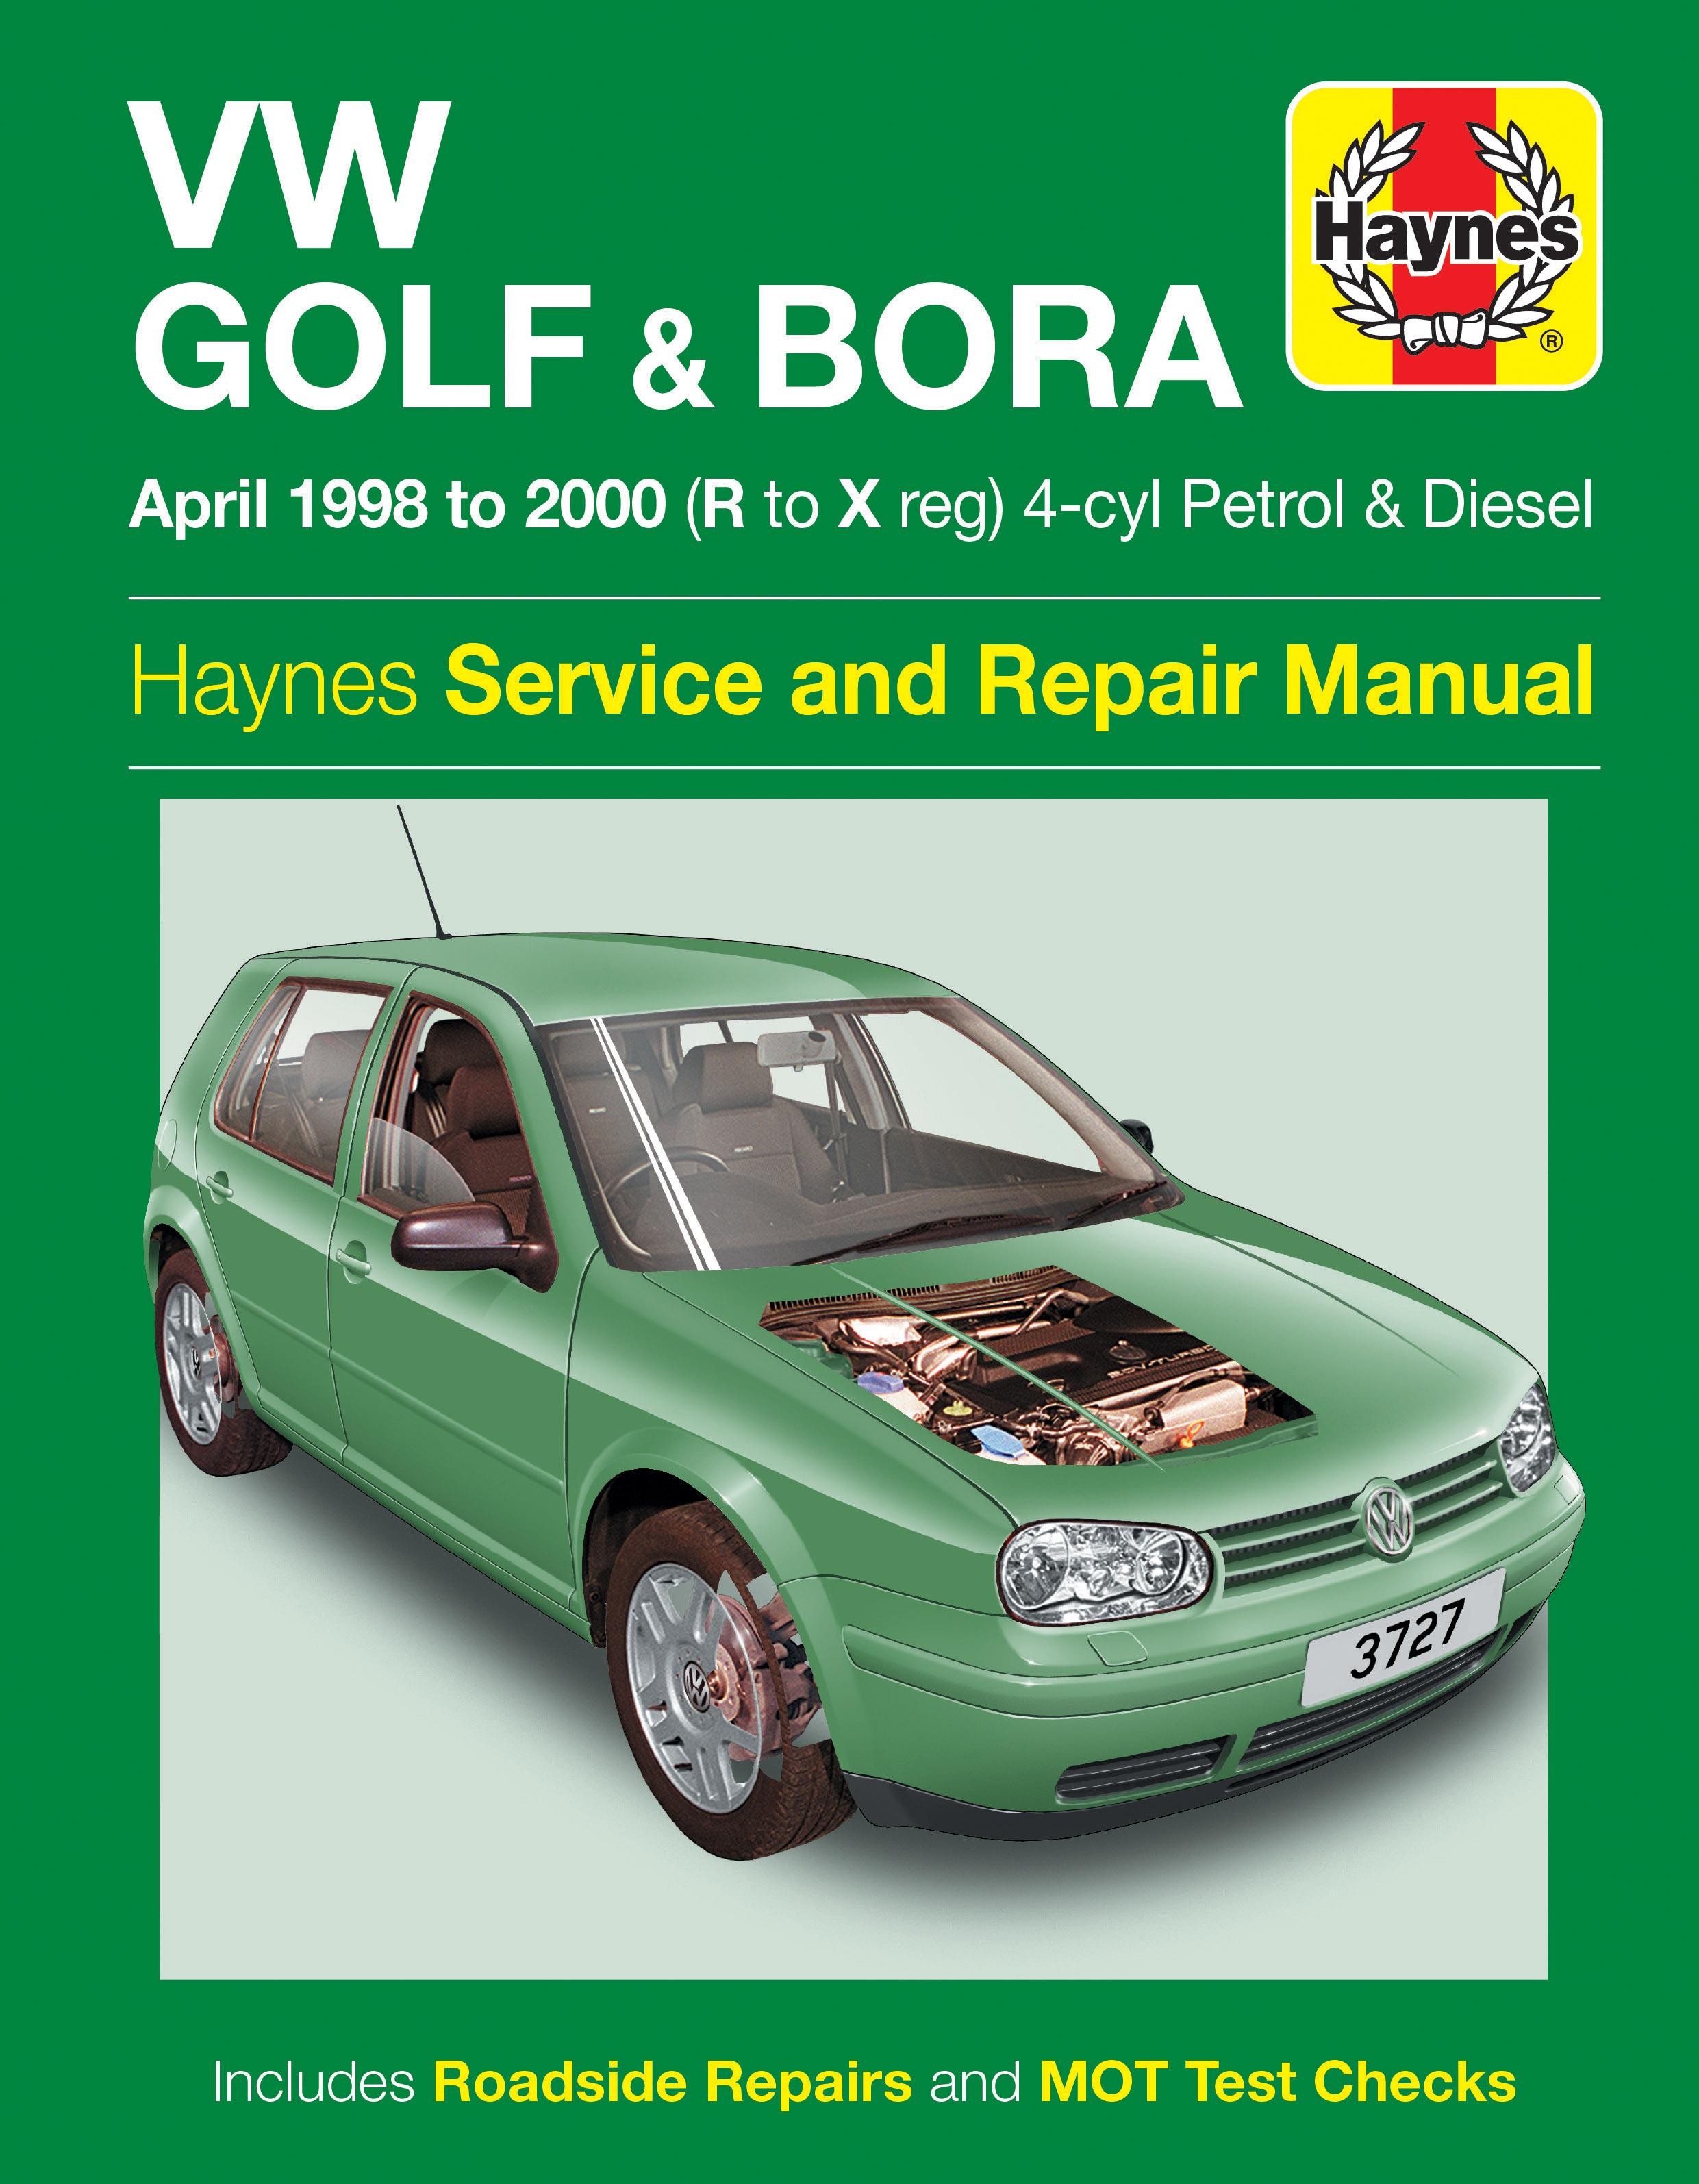 vw golf bora petrol diesel april 98 00 haynes repair manual rh haynes com vw golf iv service manual pdf download vw golf iv service manual pdf download